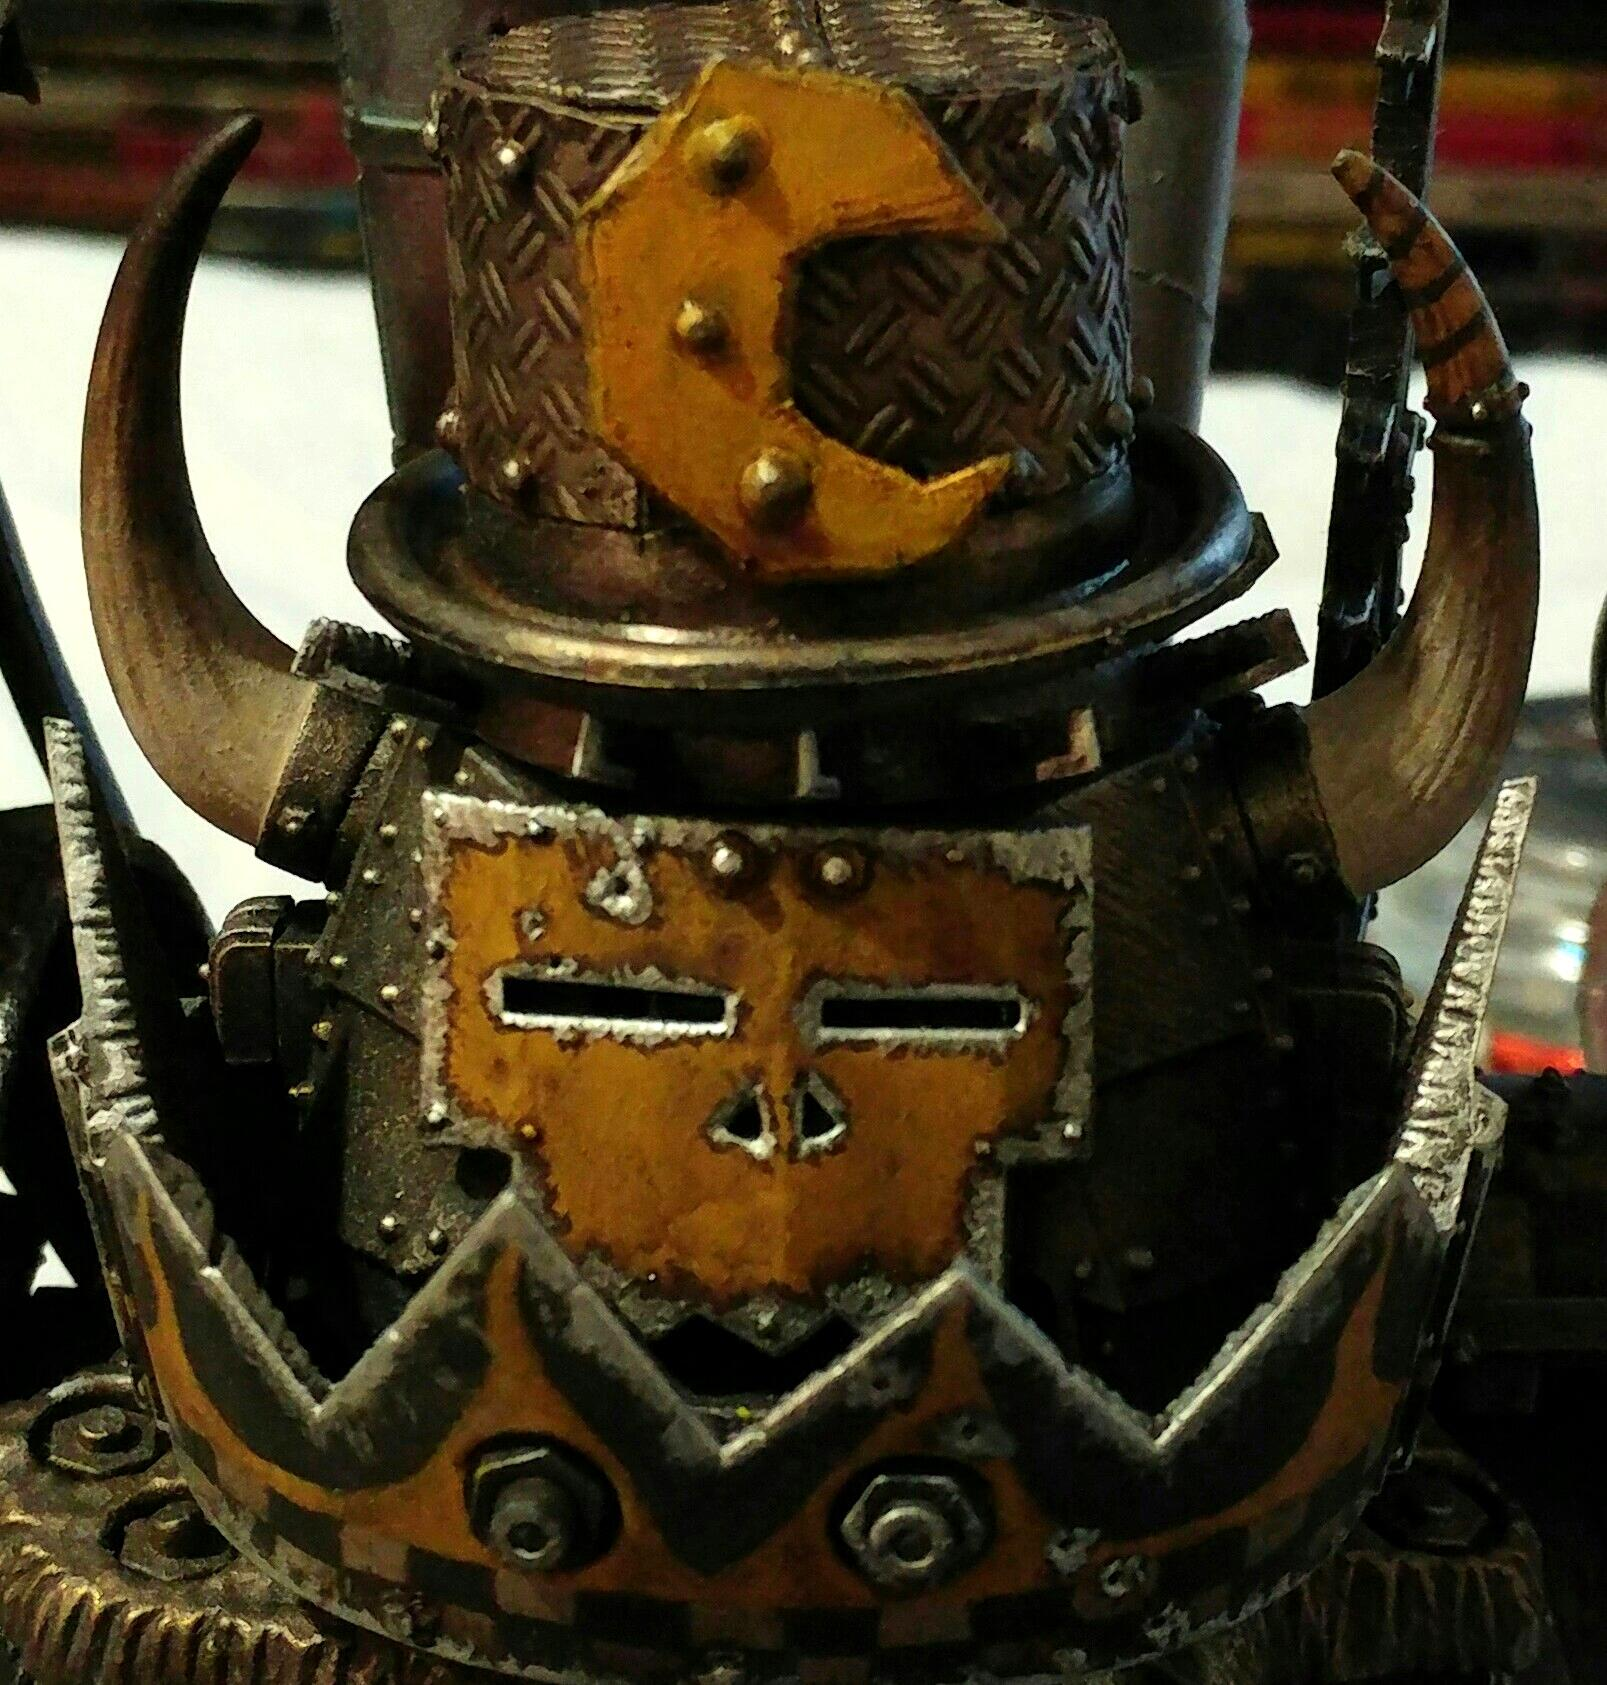 Conversion, Gargant, Giant, Hat, Metal, Moon, Orks, Scrap, Walkers, Yellow